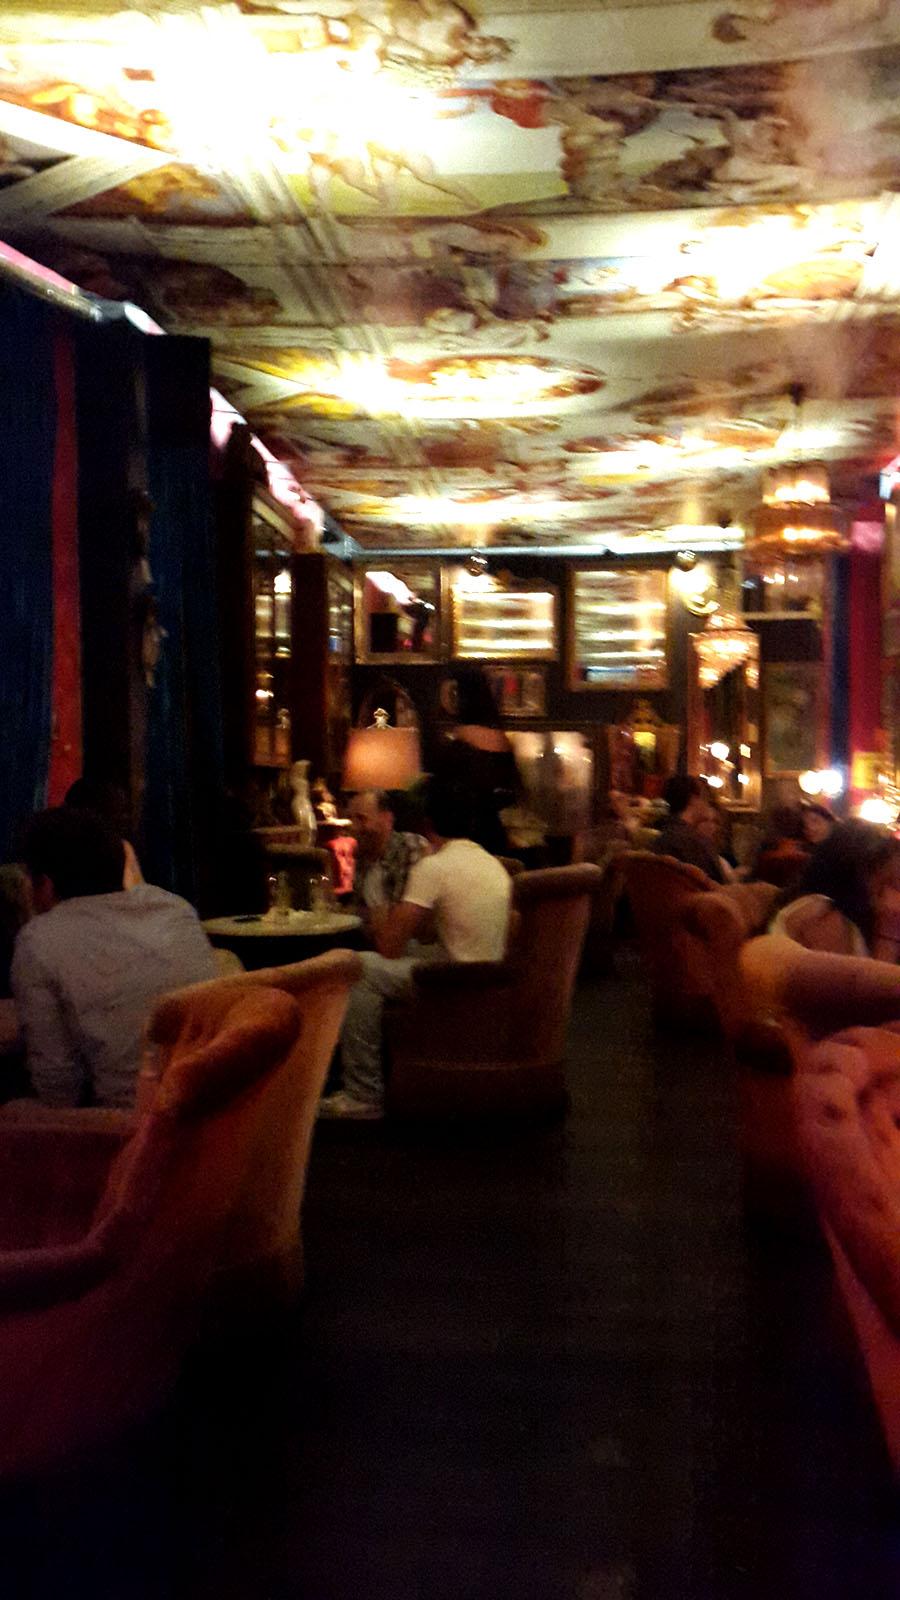 Pensão Amor bar interior - Lisbon